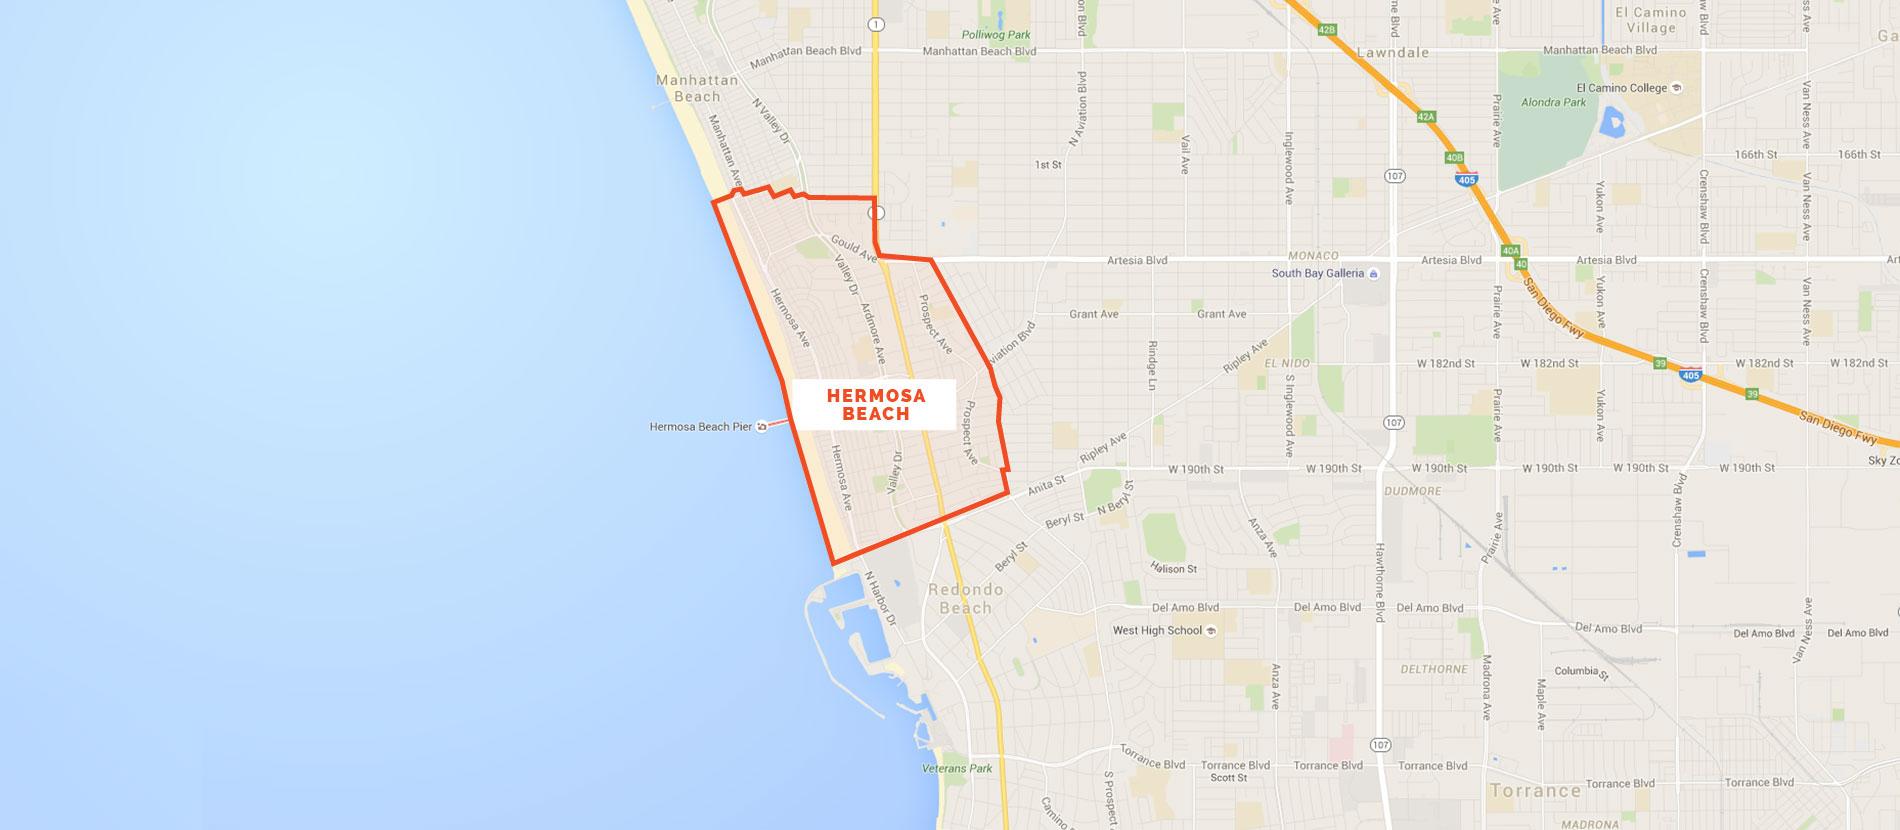 Map Of Hermosa Beach California - Klipy - Hermosa Beach California Map